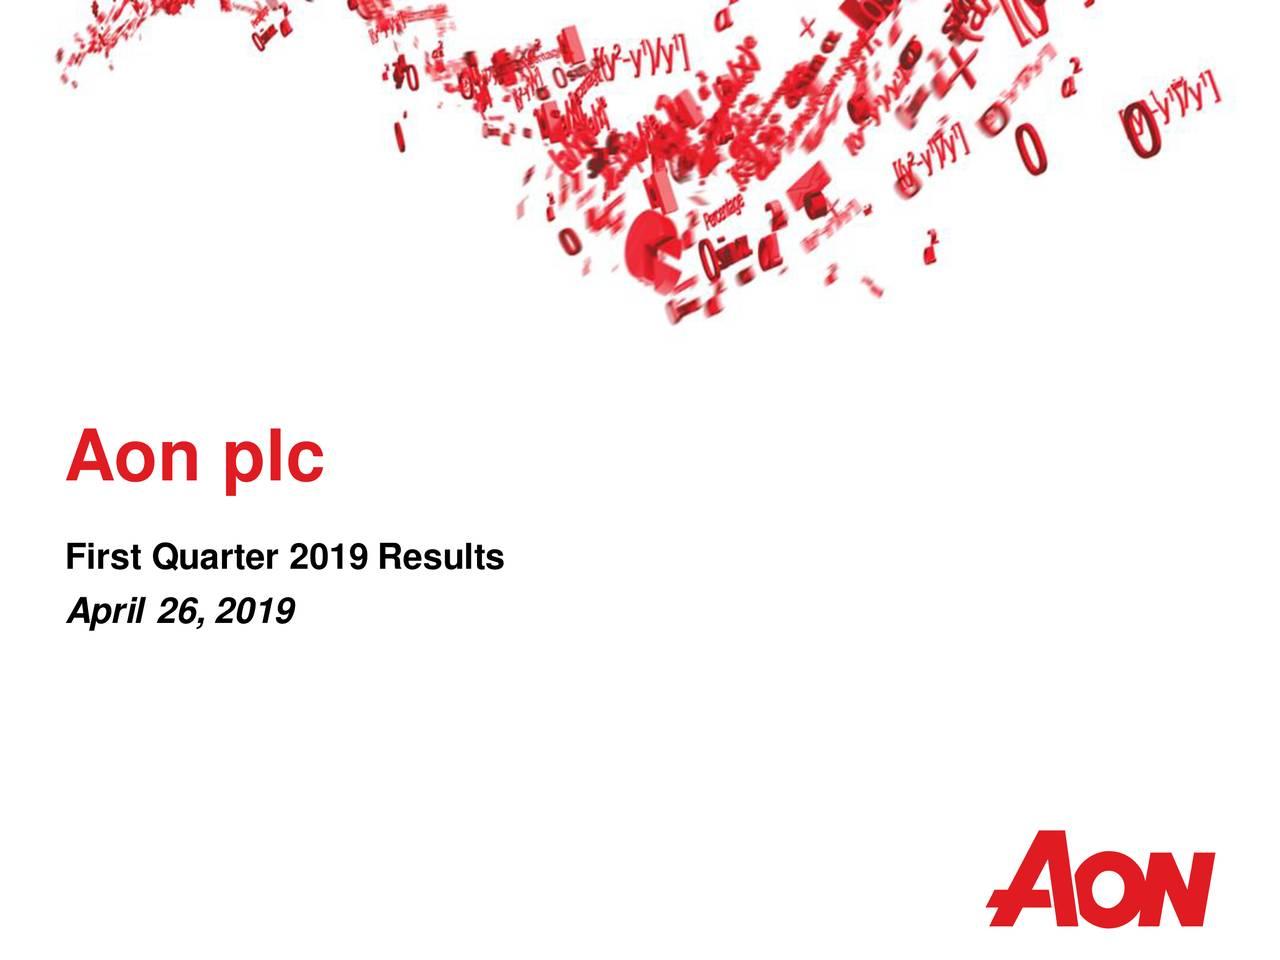 First Quarter 2019 Results April 26, 2019